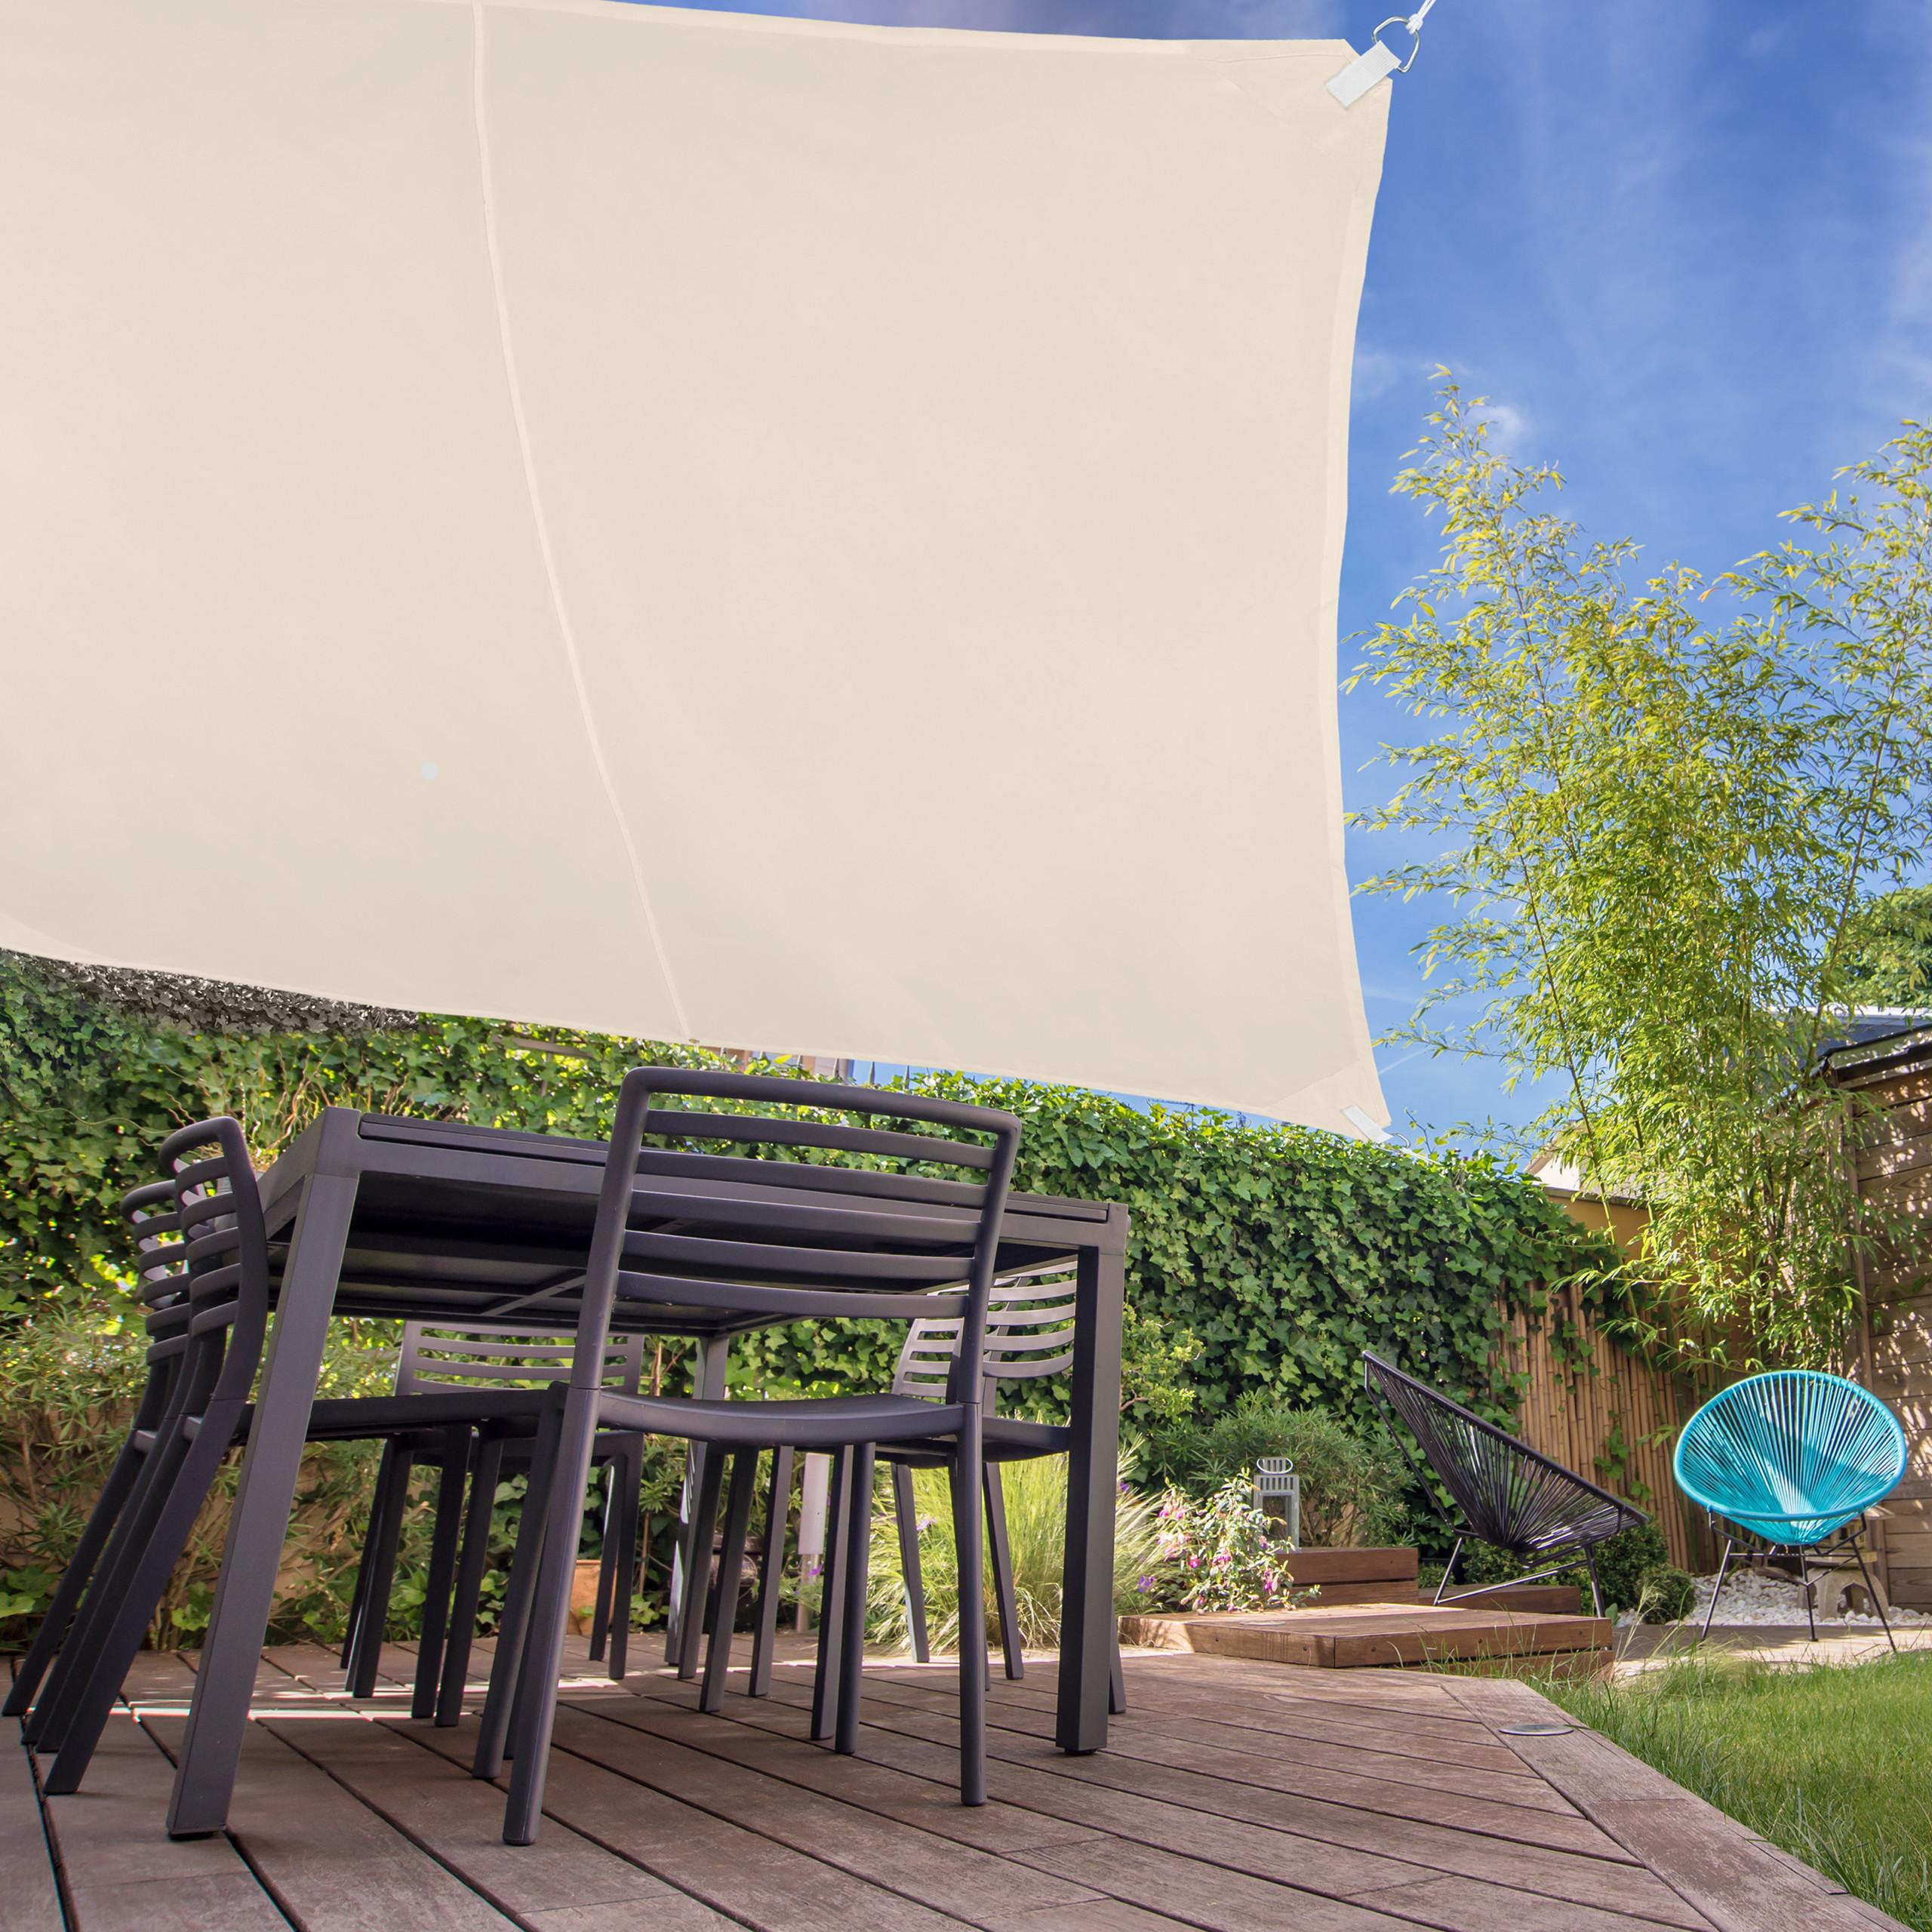 voile d ombrage carr diffuseur d ombre protection soleil. Black Bedroom Furniture Sets. Home Design Ideas